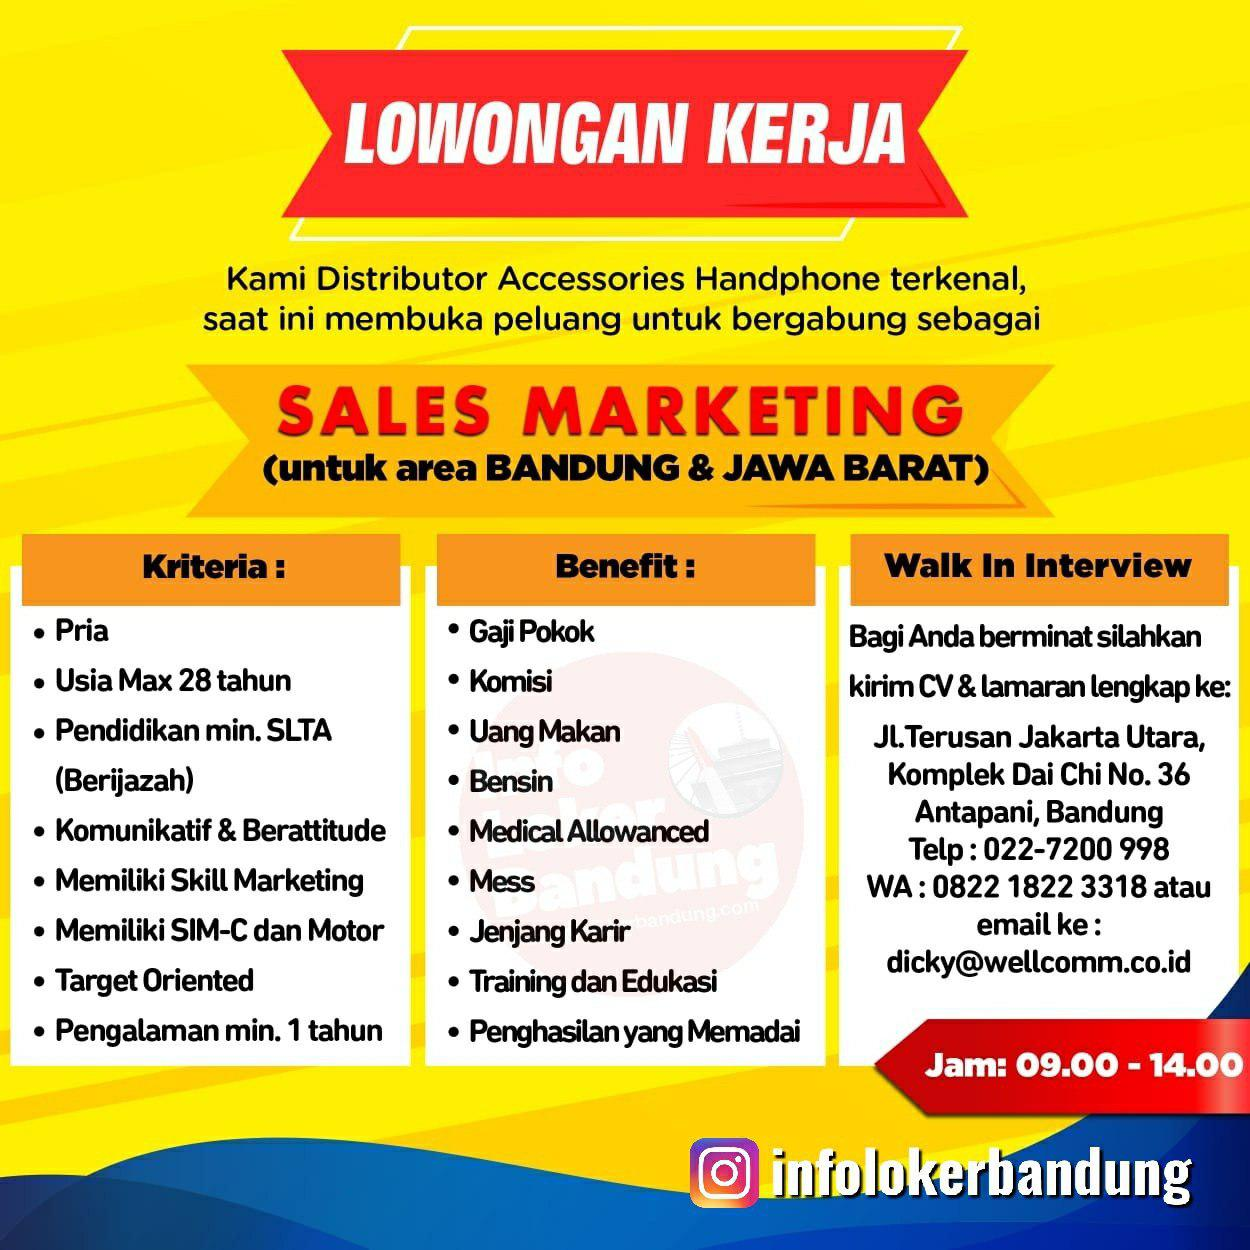 Lowongan Kerja CV. Bandung Indo Pratama (Wellcomm Gadget Accessories) Bandung Agustus 2019